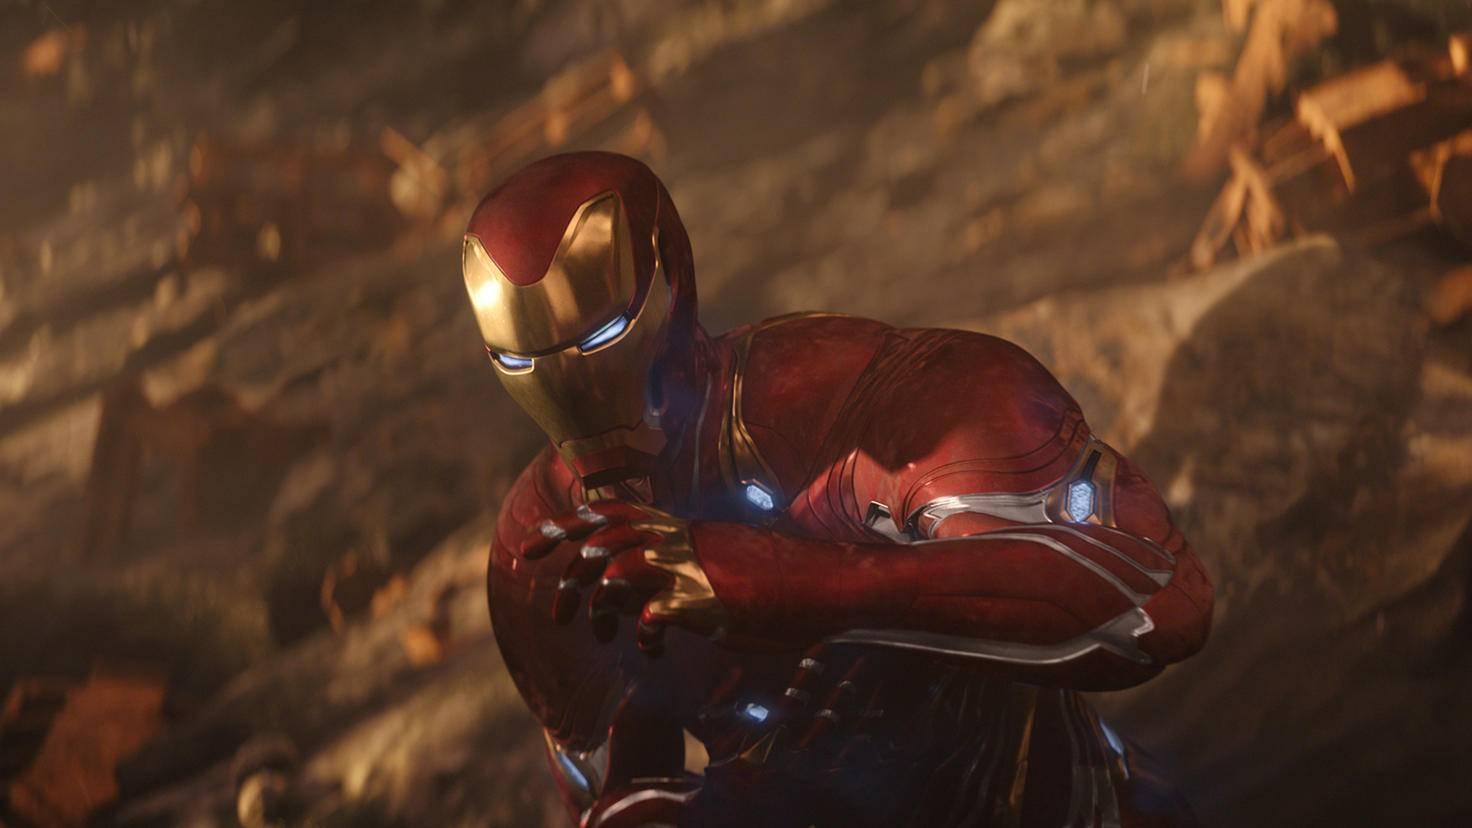 Iron Man in Avengers: Infinity War